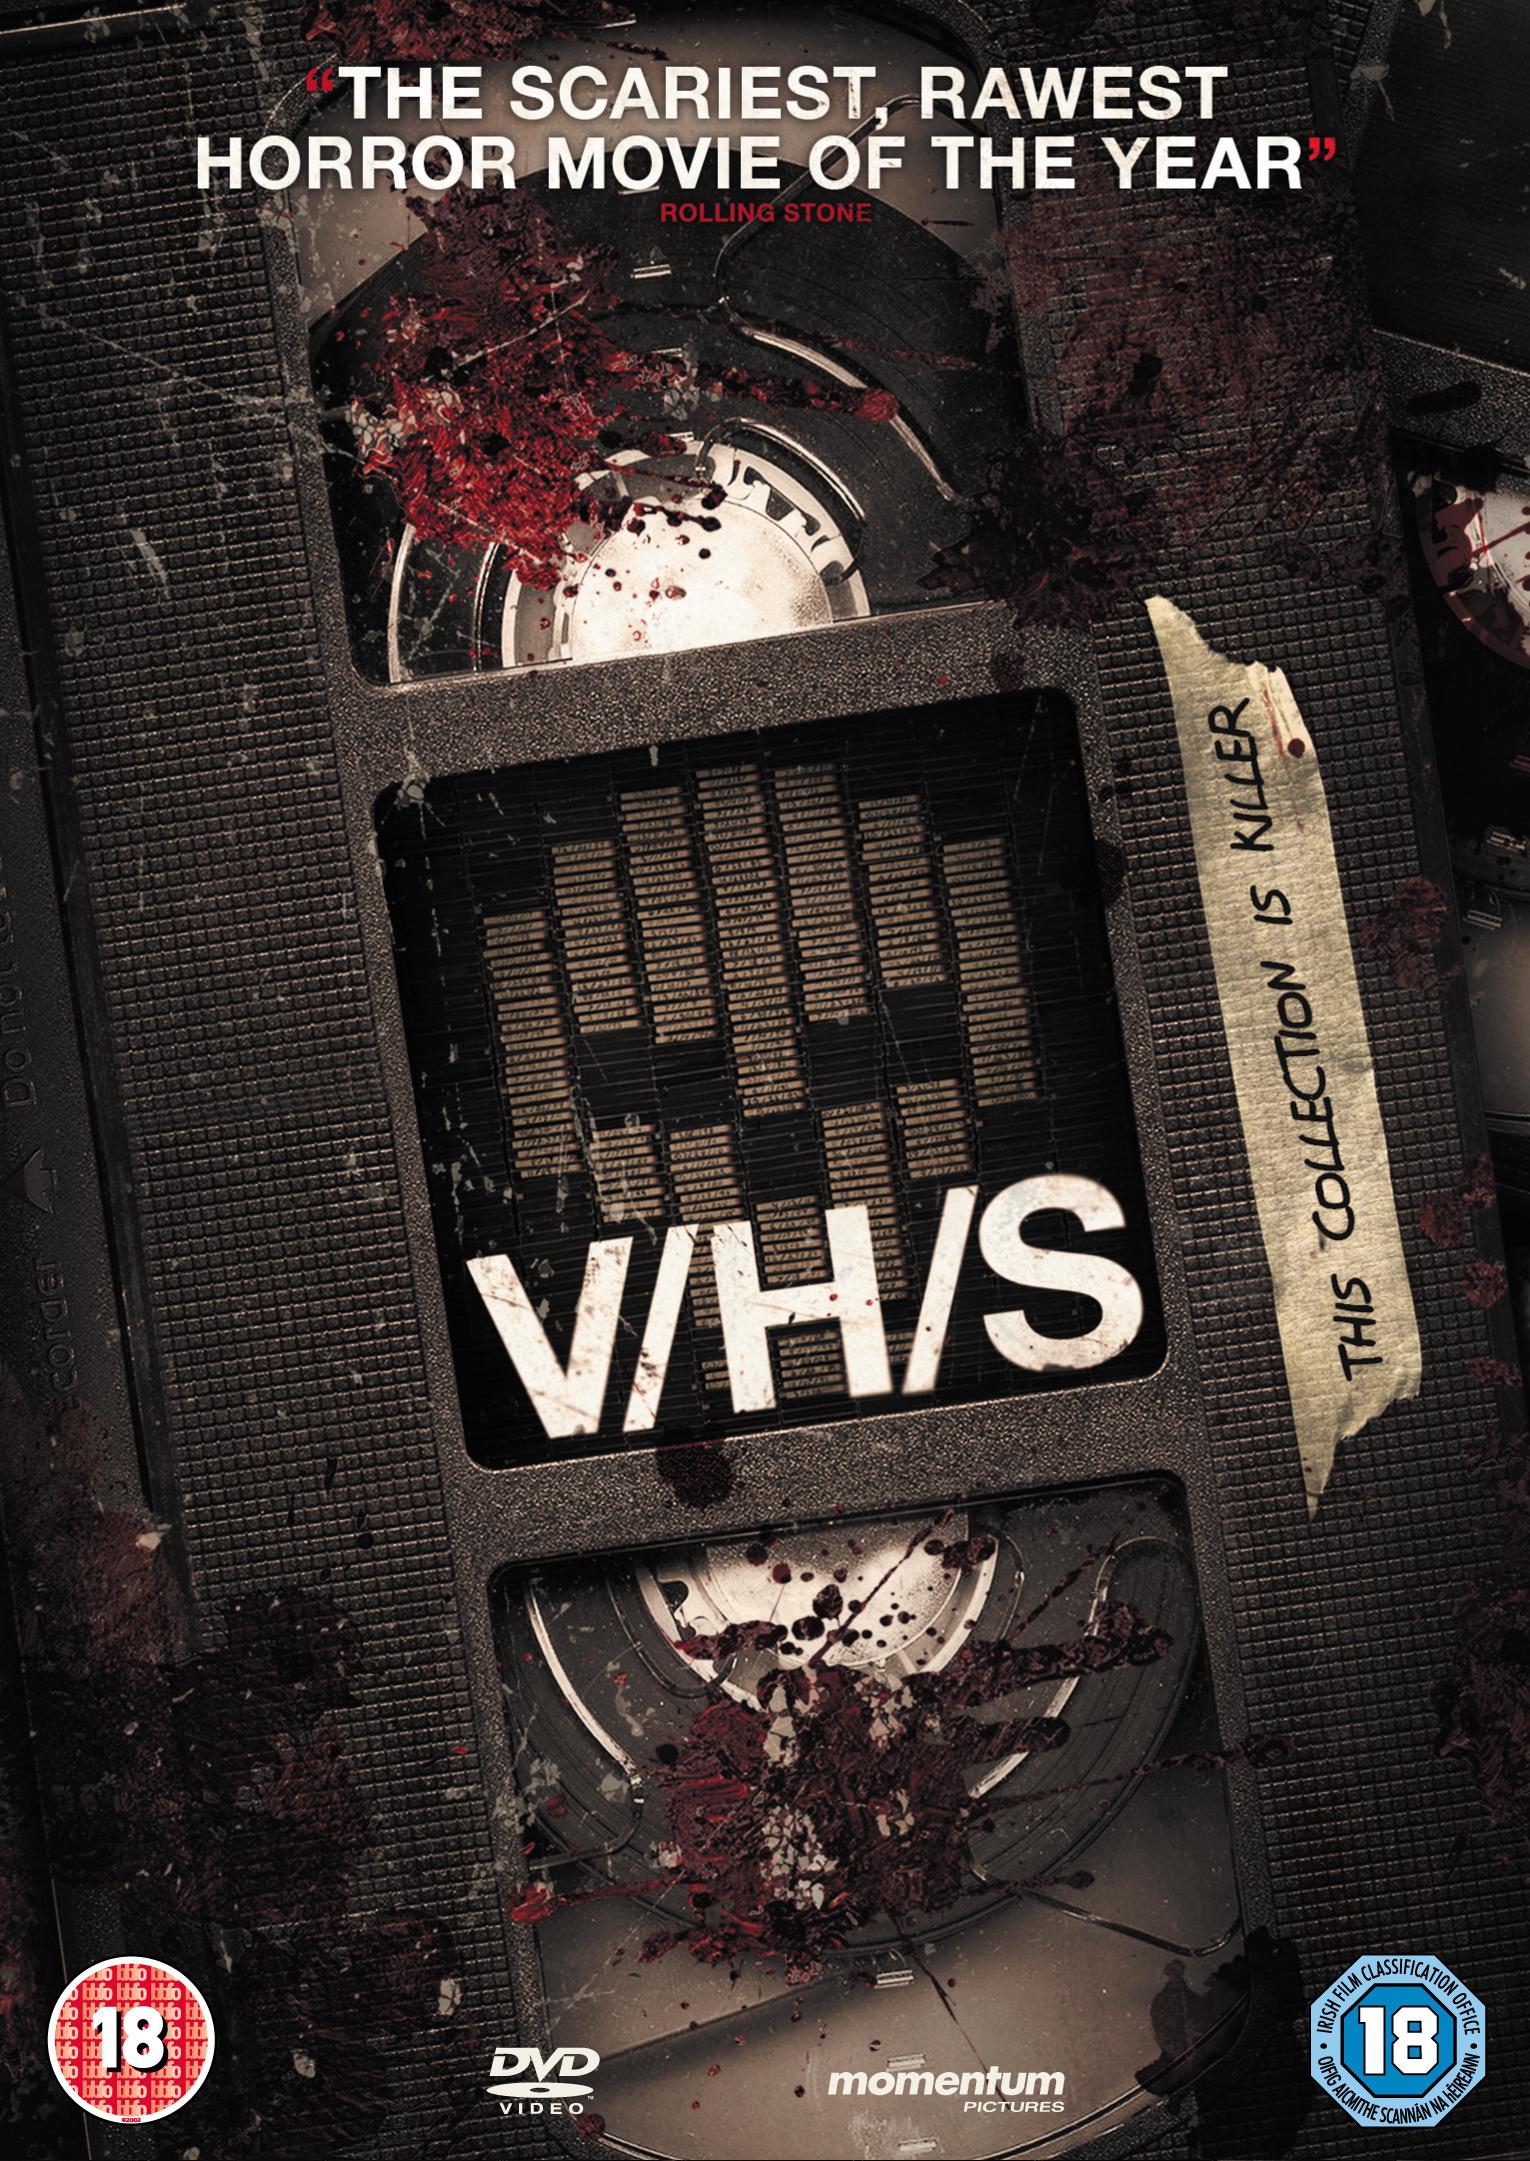 S-Vhs (Film)